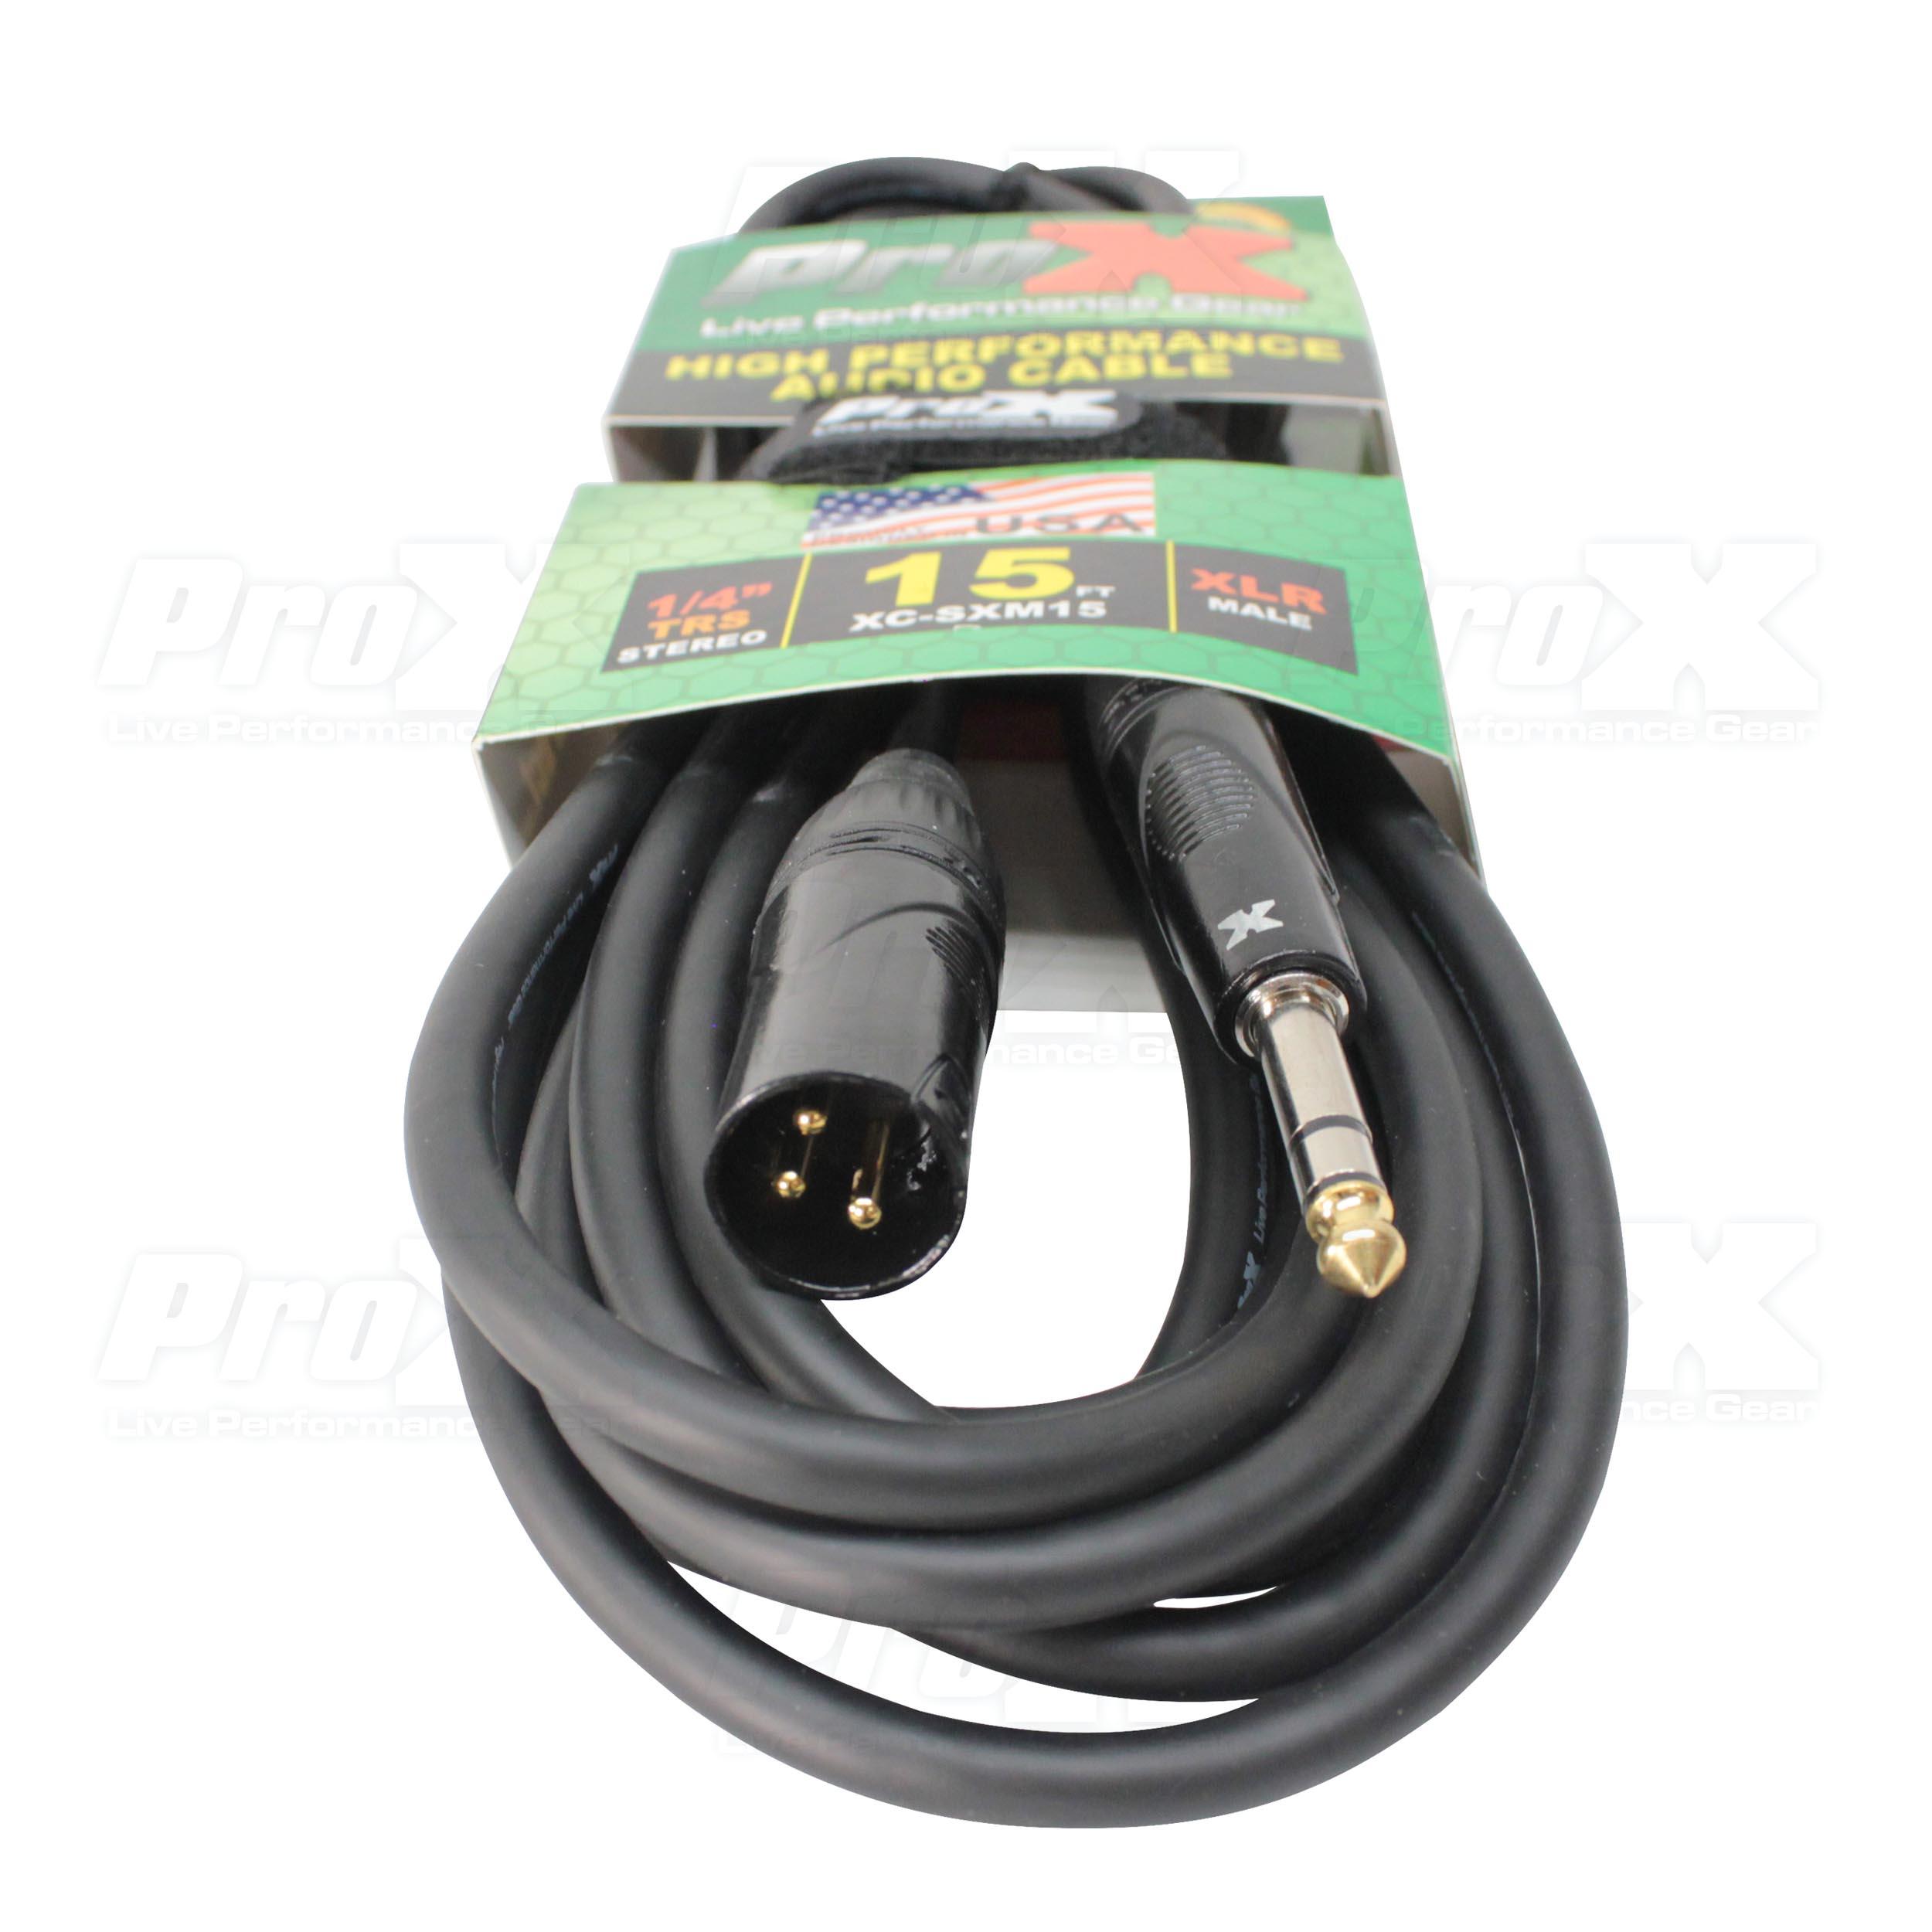 15 Ft Balanced 1 4 Trs To Xlr M Prox Live Performance Gear Usb Wiring Xc Sxm15